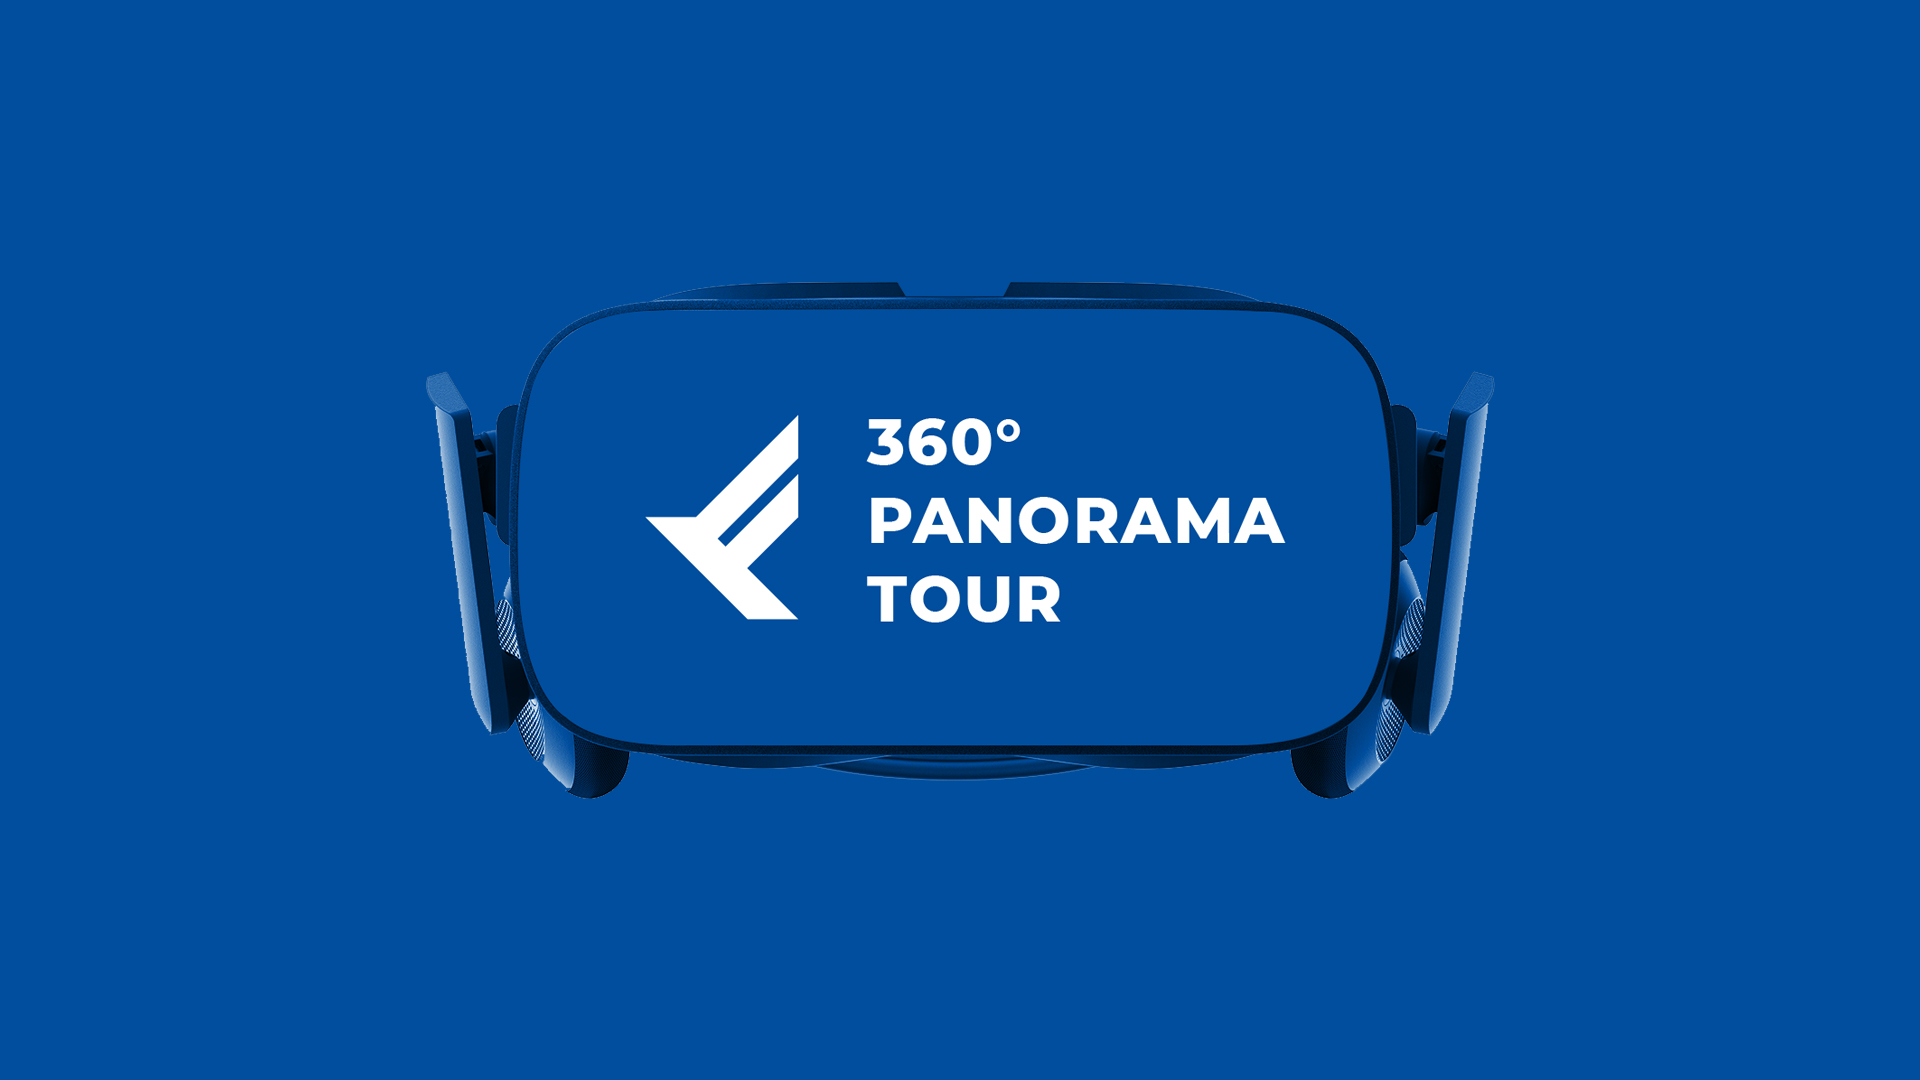 emplify Referenzprojekt Stuttgart Airport 360 Grad Panorama Tour